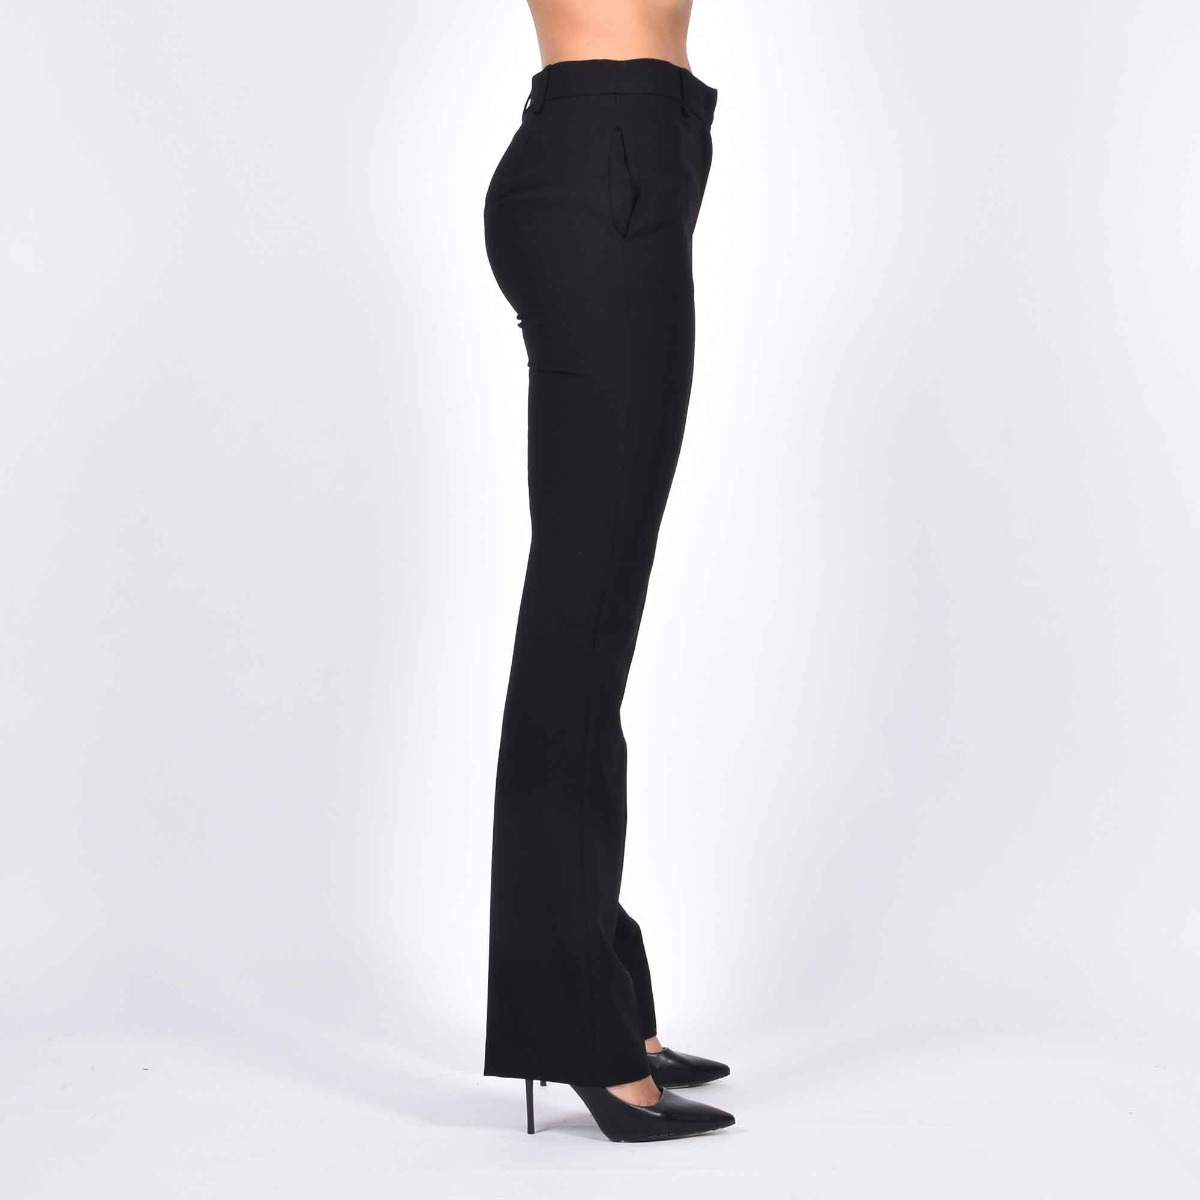 Pantalone loghino- Nero